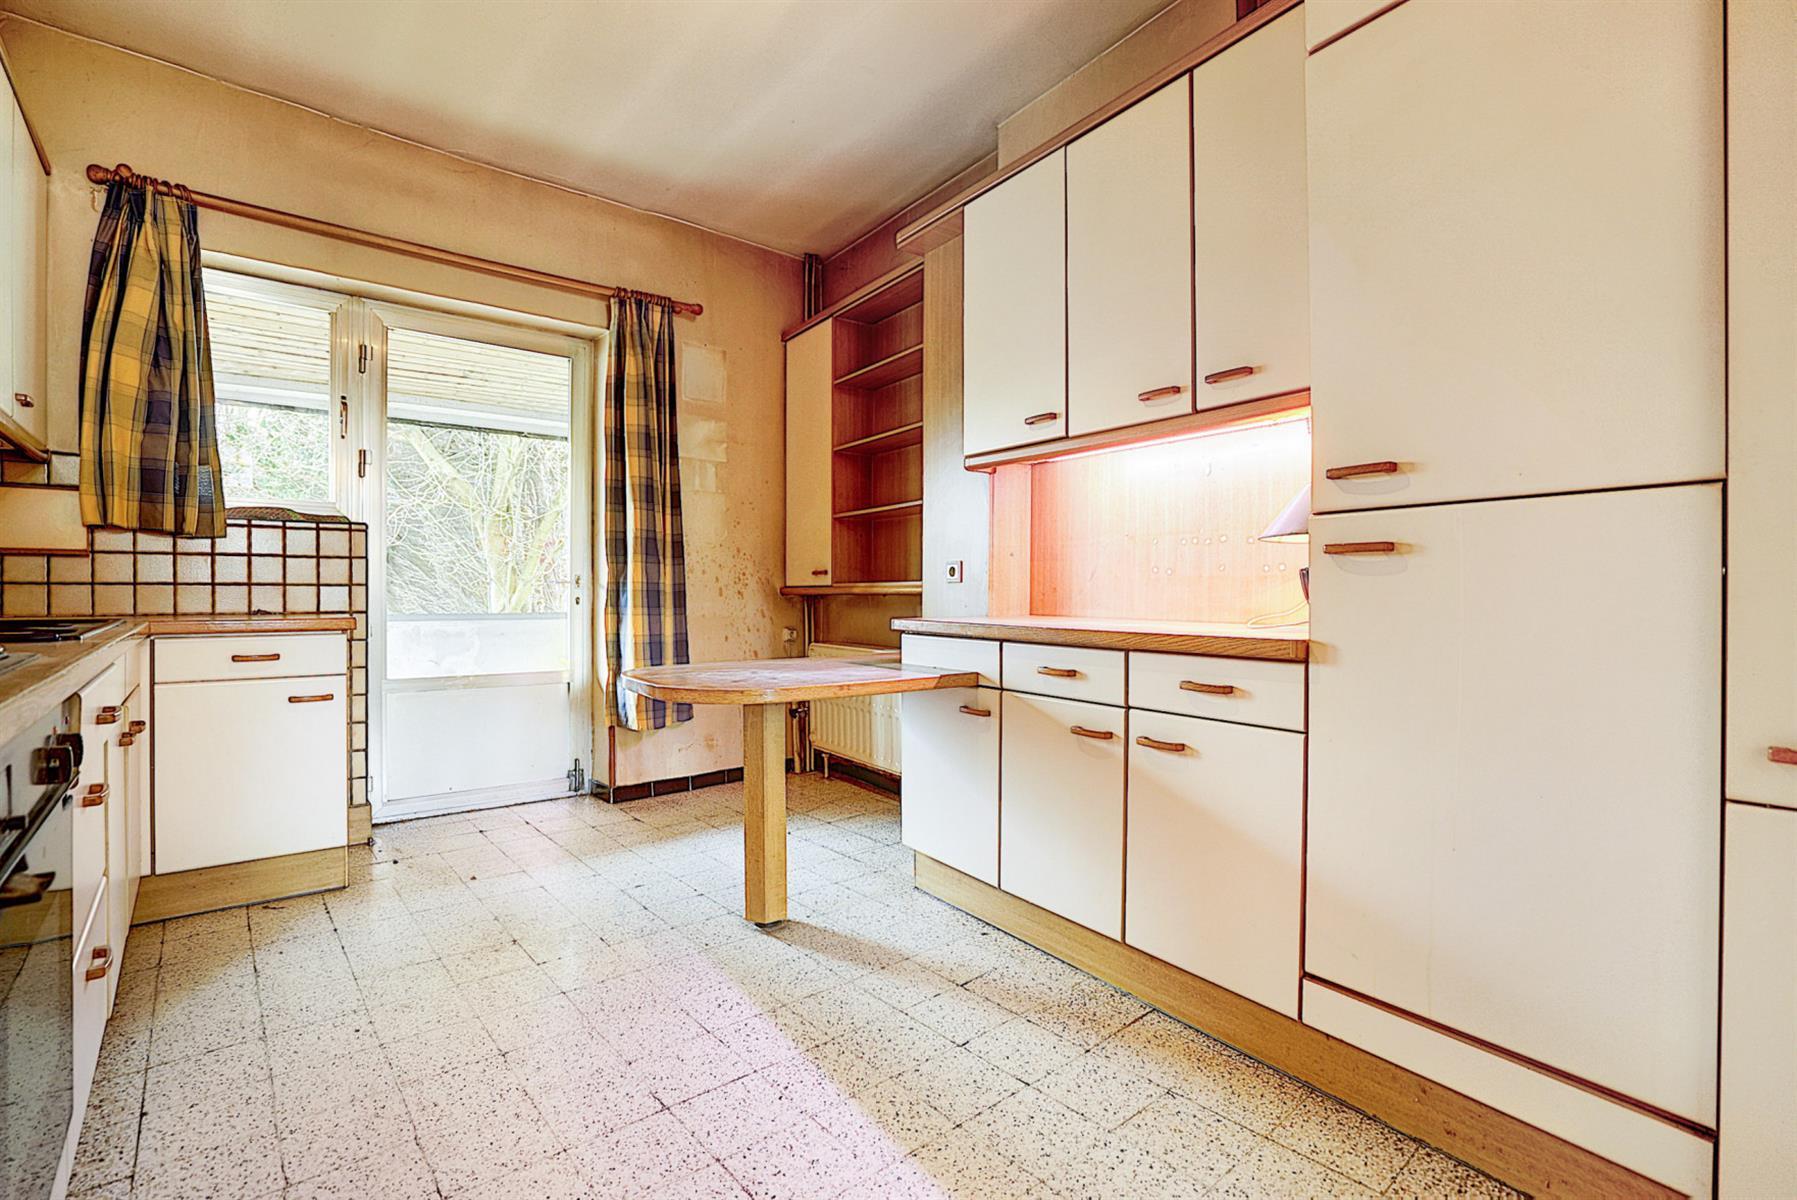 Maison - Ottignies-Louvain-la-Neuve - #4262981-3